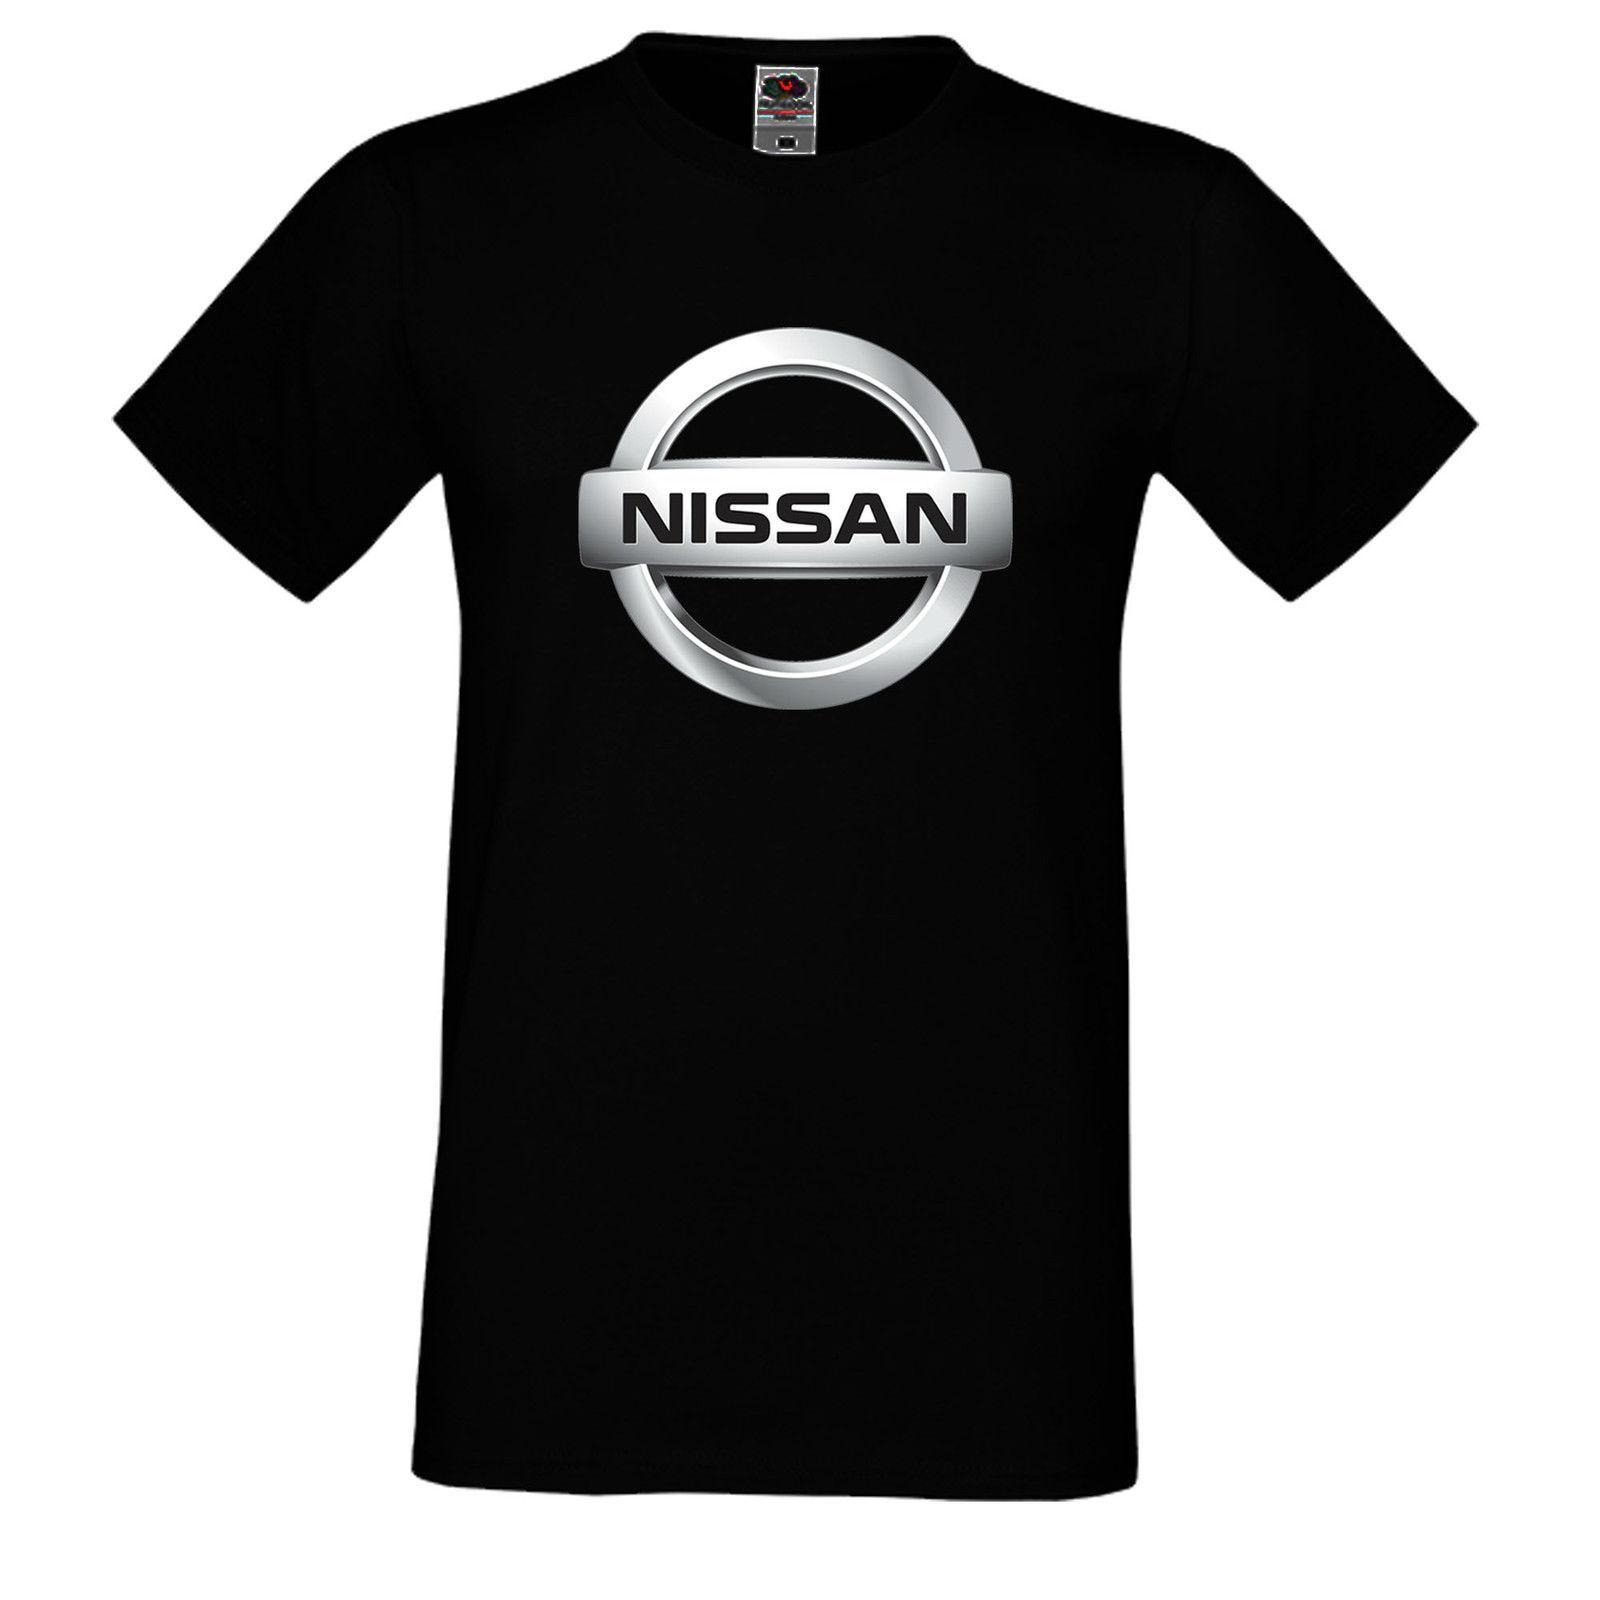 Herren Men T Shirt Nissan Logo Tee White Black Kurzarm Shortsleeves Suit Hat Pink T Shirt Shirt And Tshirt Create Your Own T Shirt Design From Qz106152964 16 24 Dhgate Com